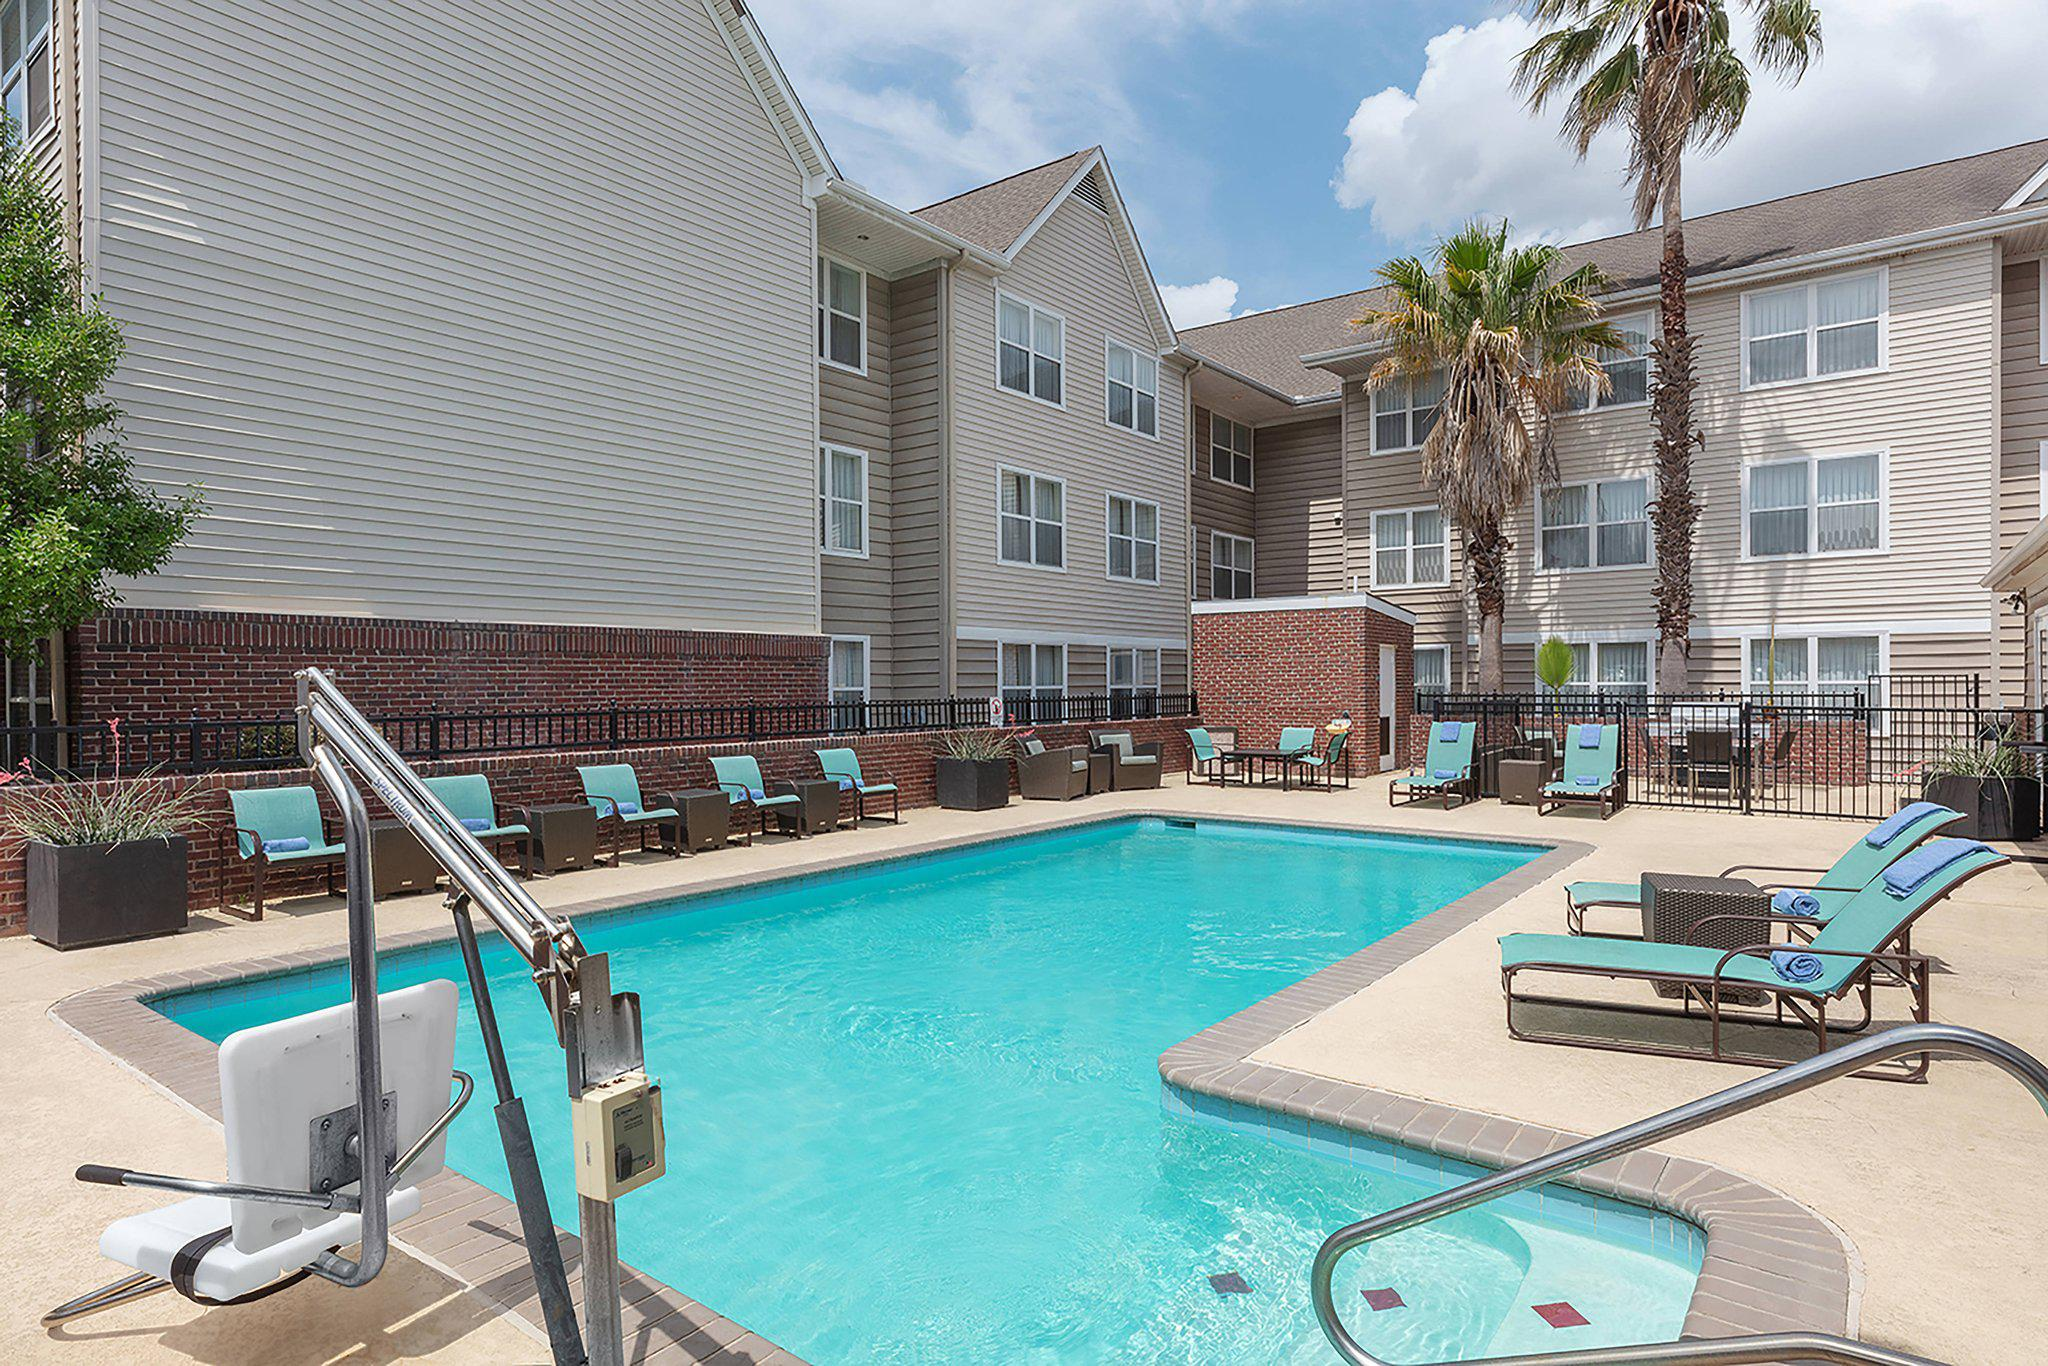 Residence Inn by Marriott Austin Round Rock/Dell Way